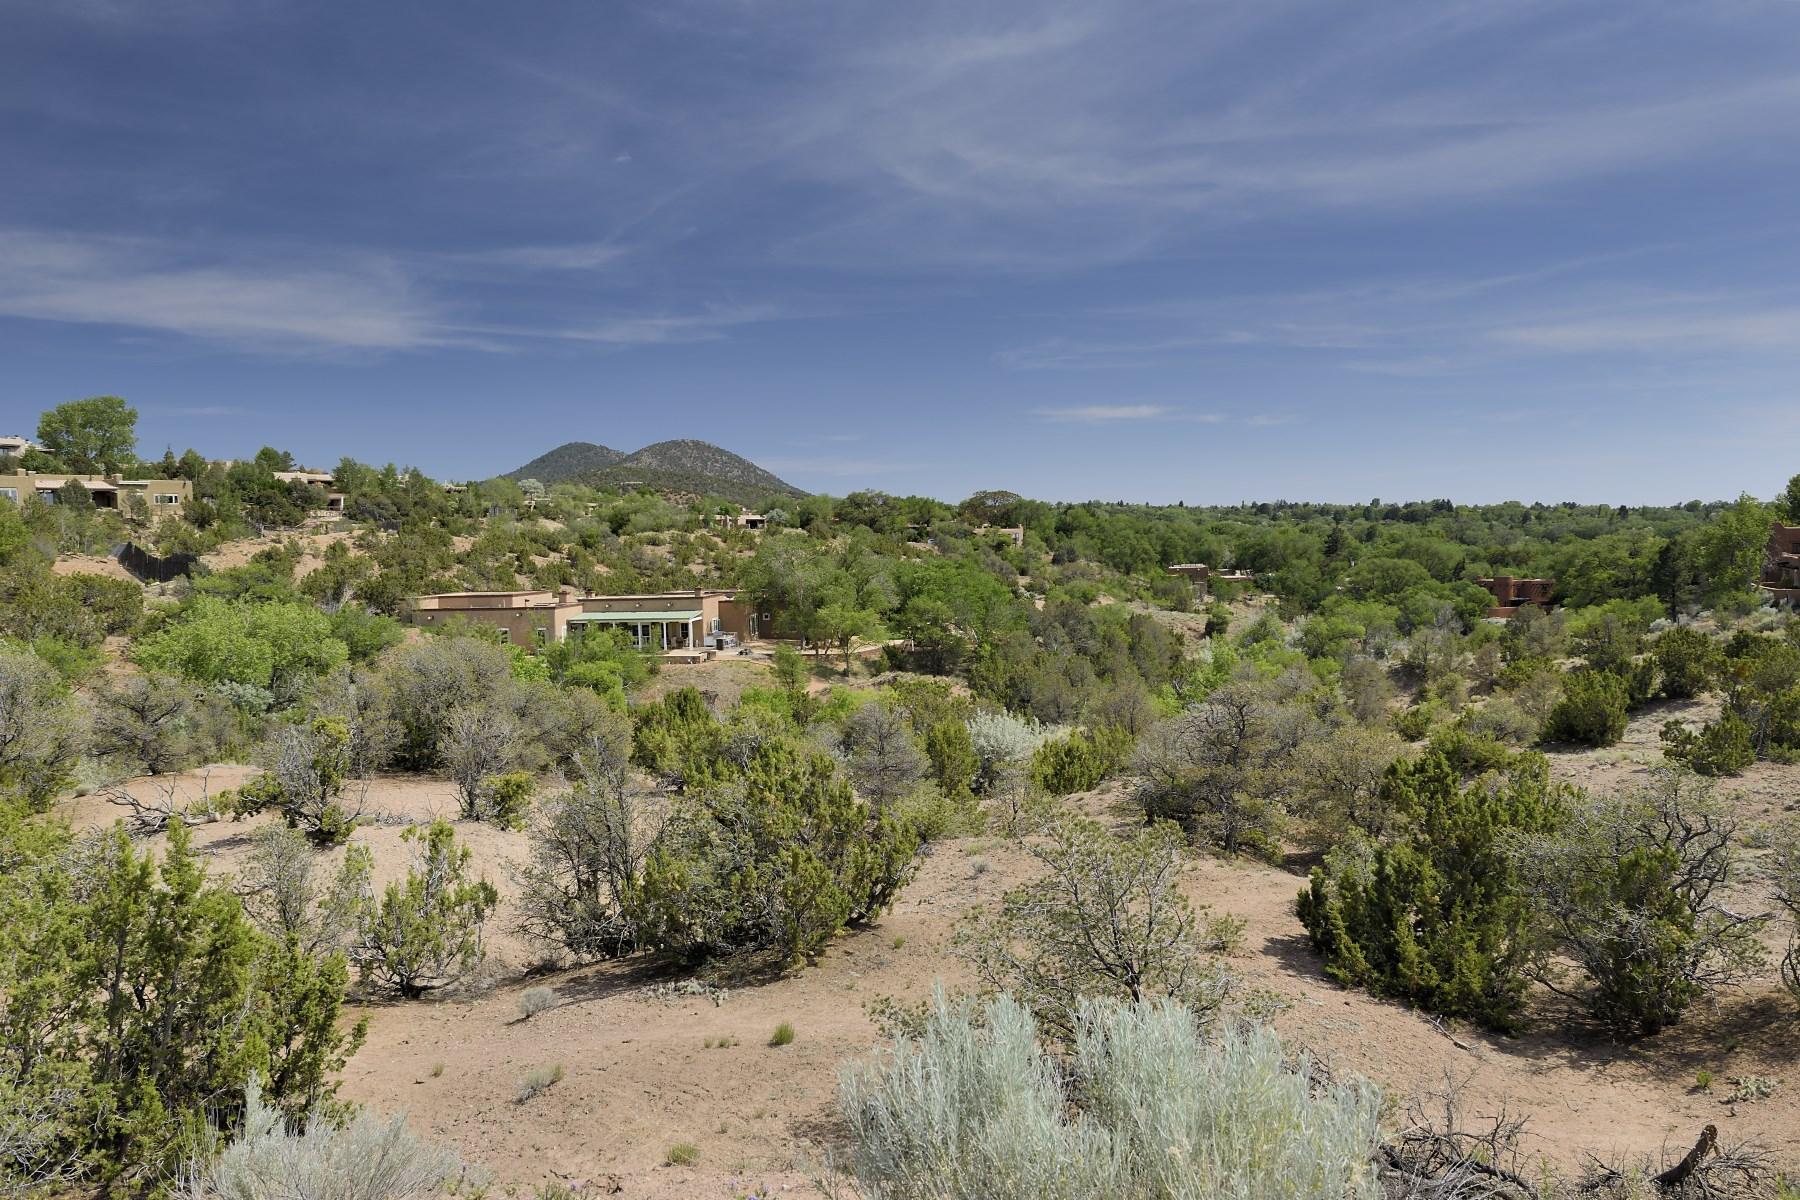 Land for Sale at 808 La Vereda Este, Lot 87 808 La Vereda Este Lot 87 Santa Fe, New Mexico 87501 United States